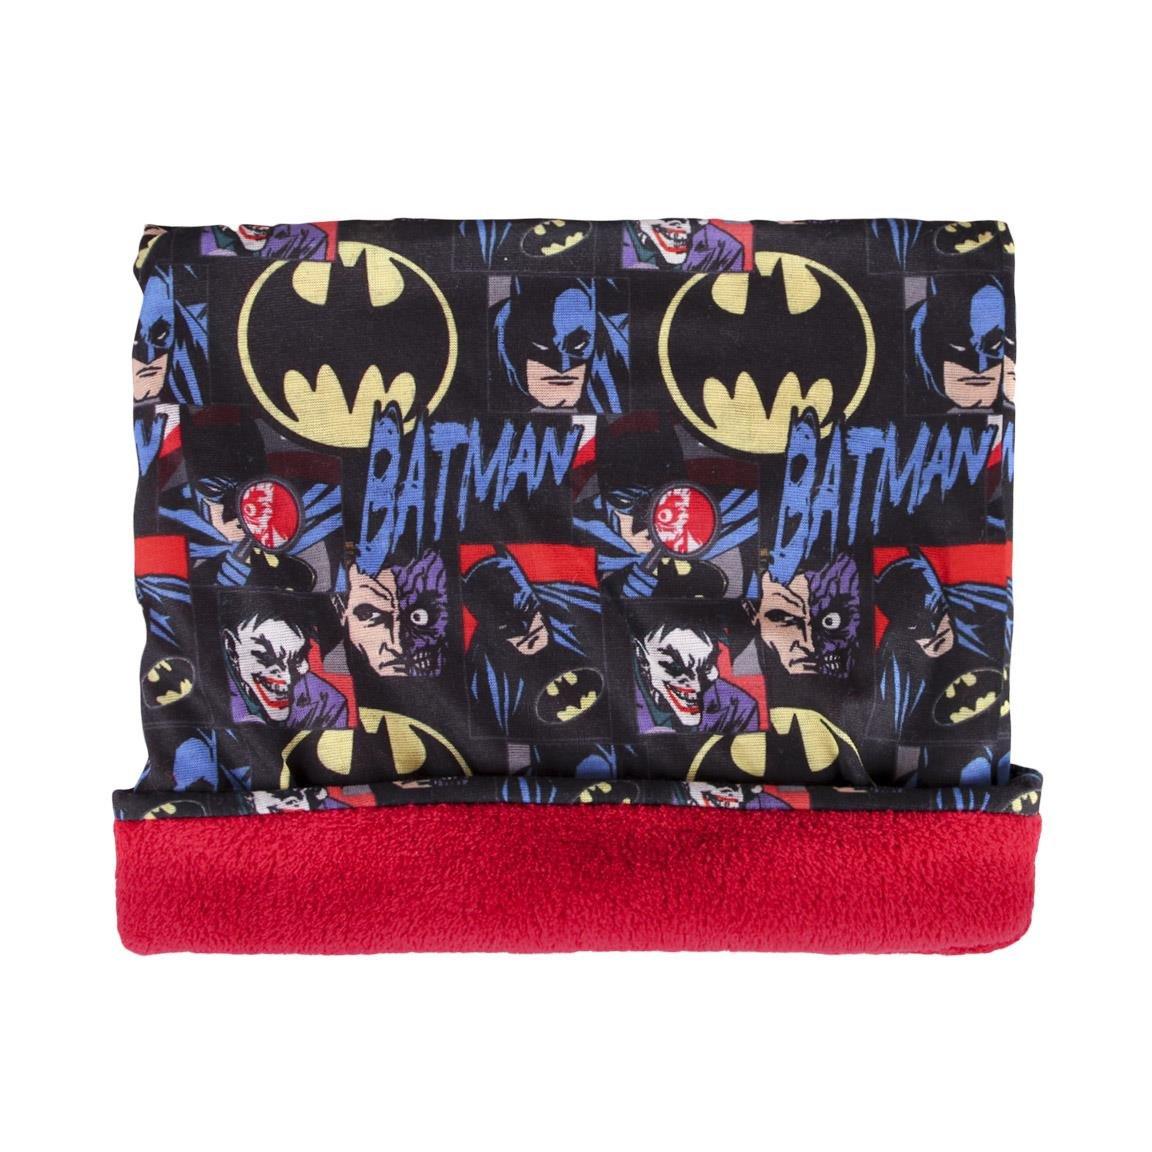 takestop/® Scaldacollo Sciarpa Multiuso Batman Joker DC Comics Felpato Bandana Fascia Cappello Cartone Animato Bambino Bambina Idea Regalo Invernale